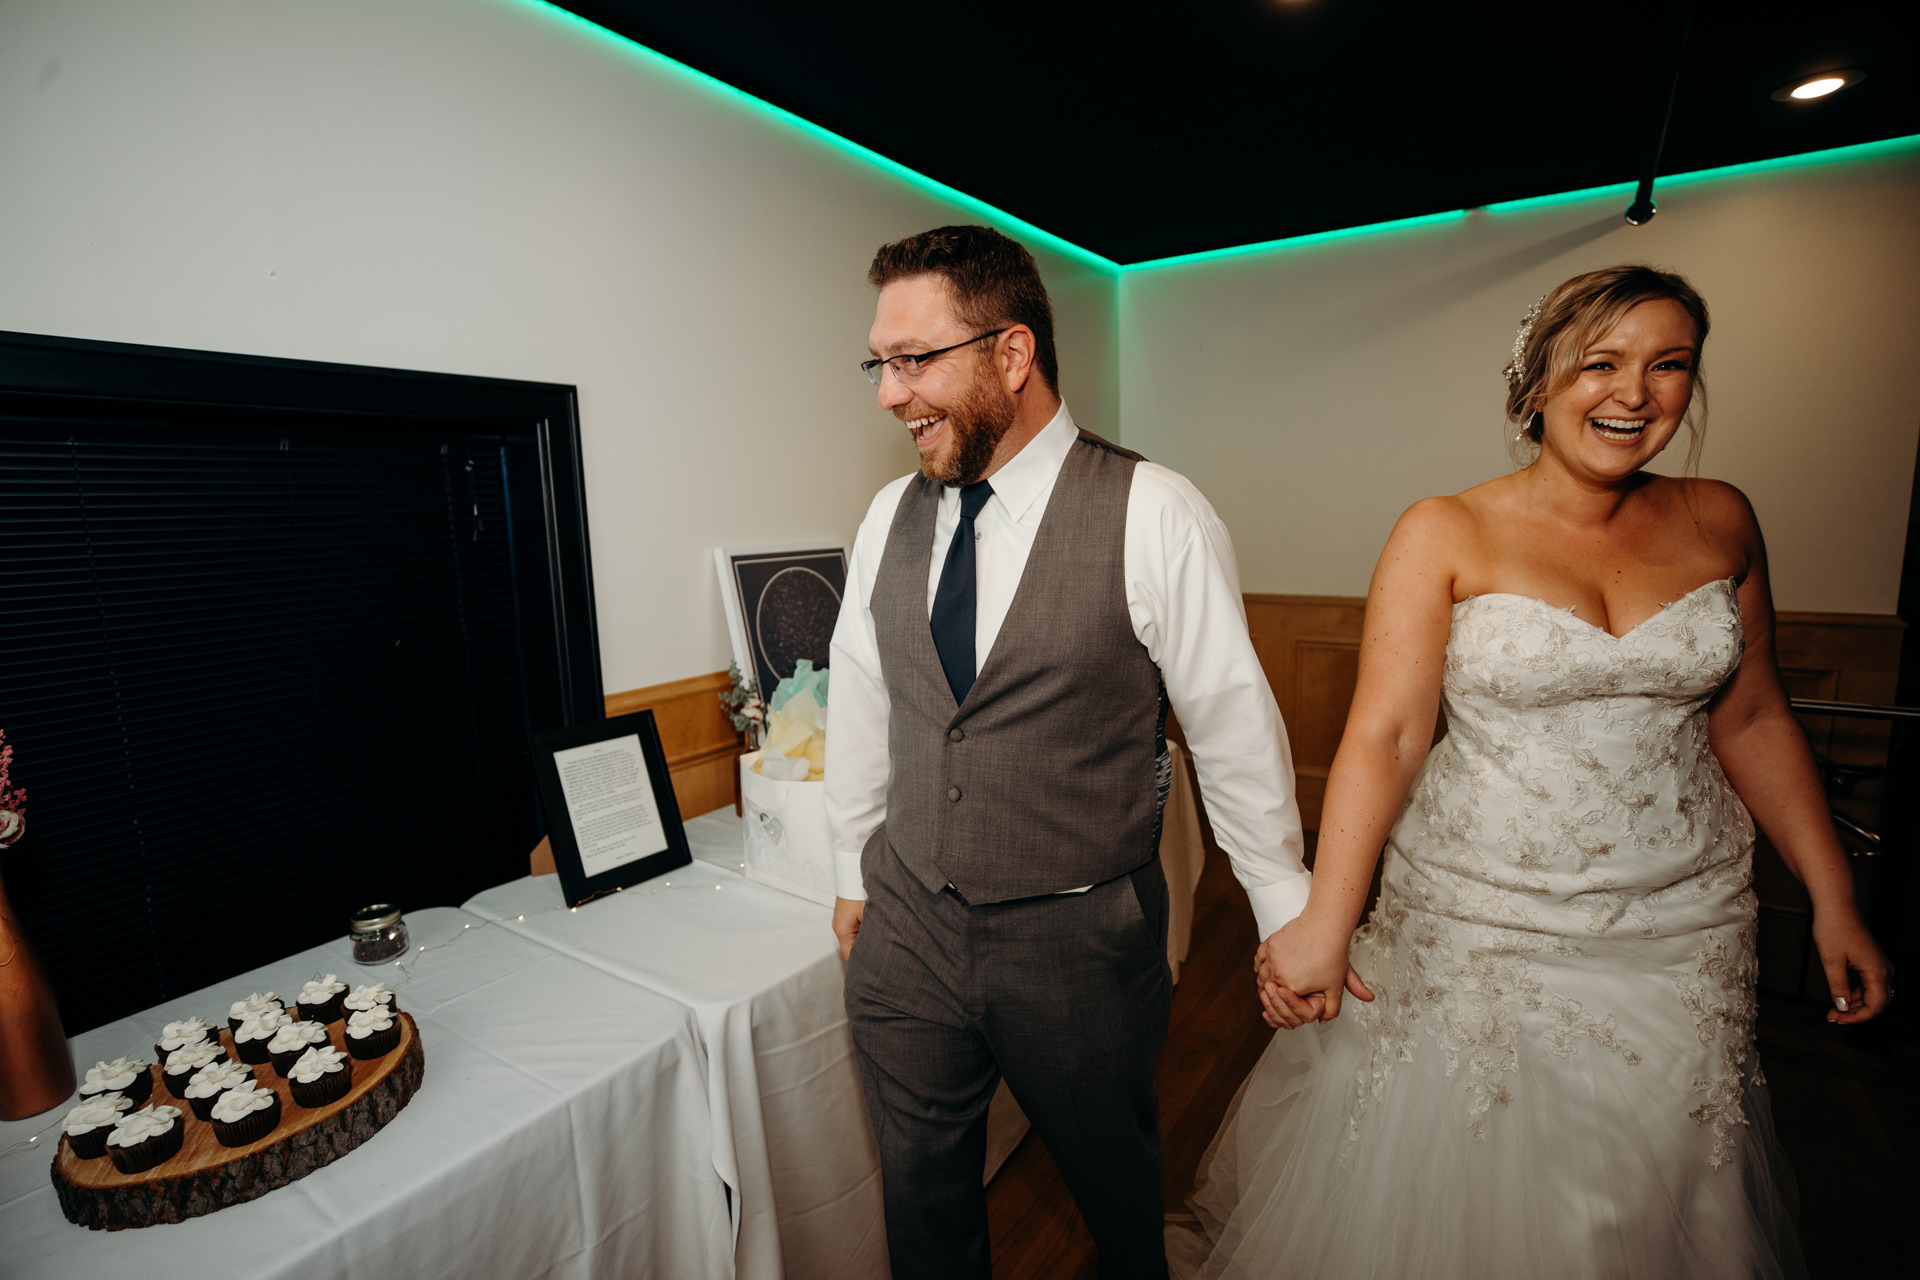 Grant Beachy Weddings photography elkhart south bend goshen warsaw-052.jpg